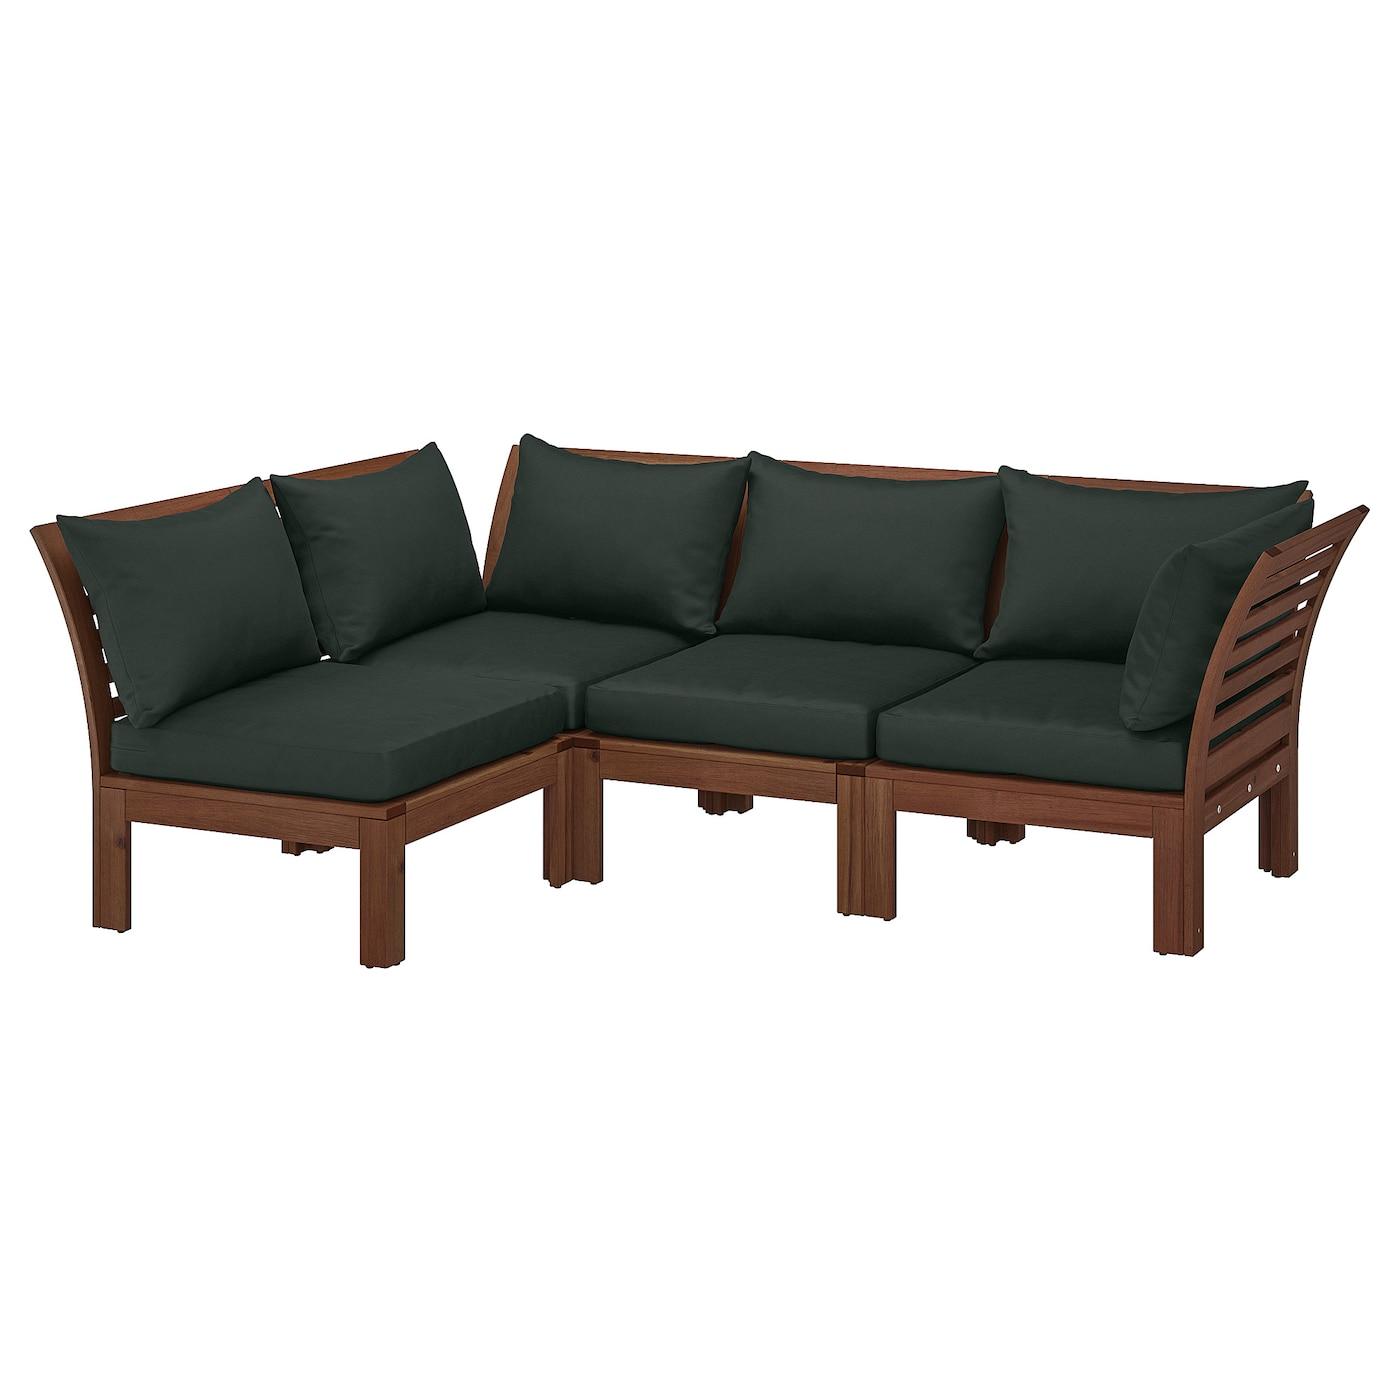 Modular corner sofa 3-seat, outdoor ÄPPLARÖ brown stained, Hållö black black